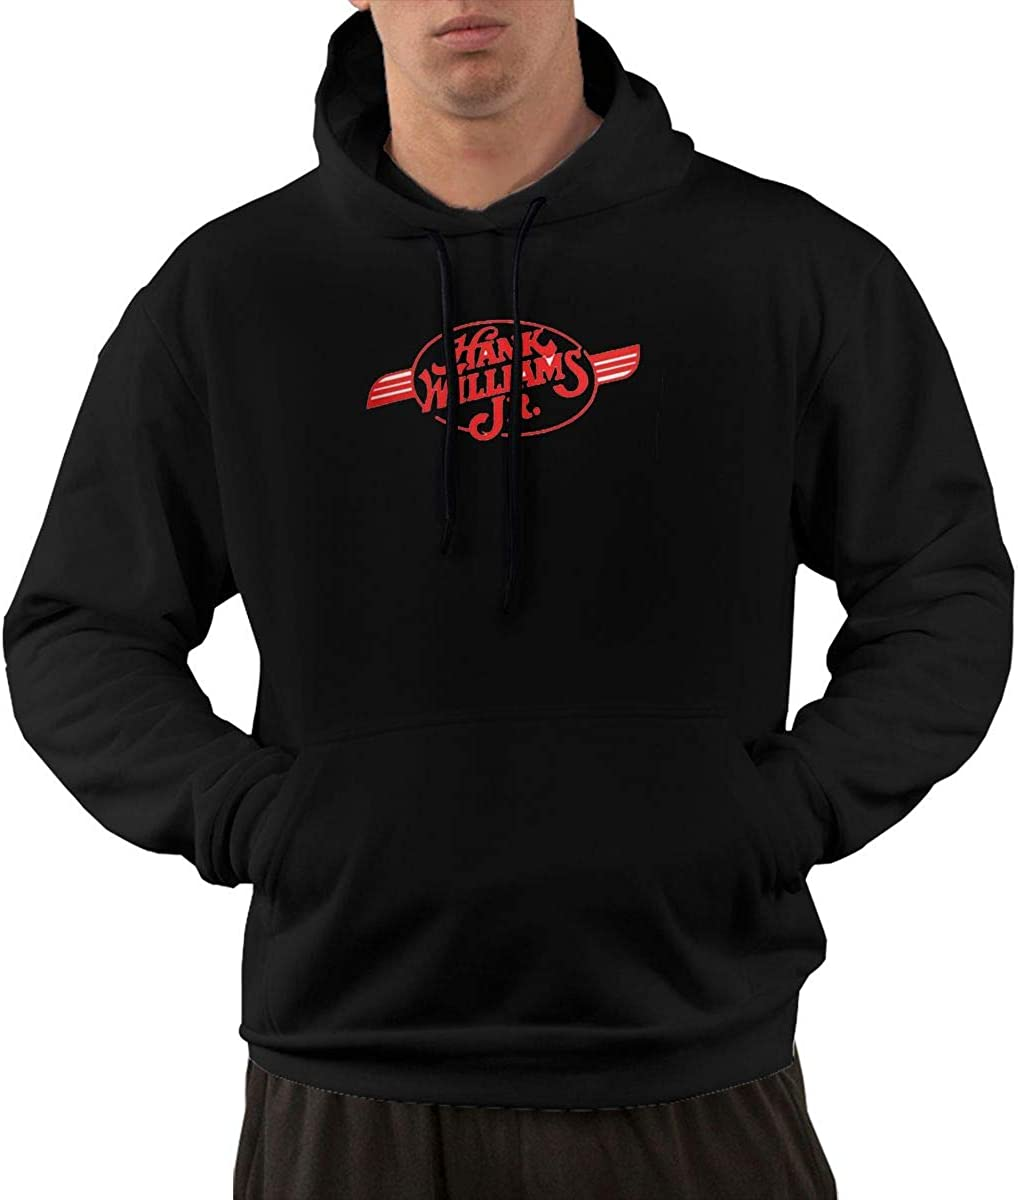 Mens Hank Williams Jr Long Sleeves Fashion Sweatshirt with Pocket